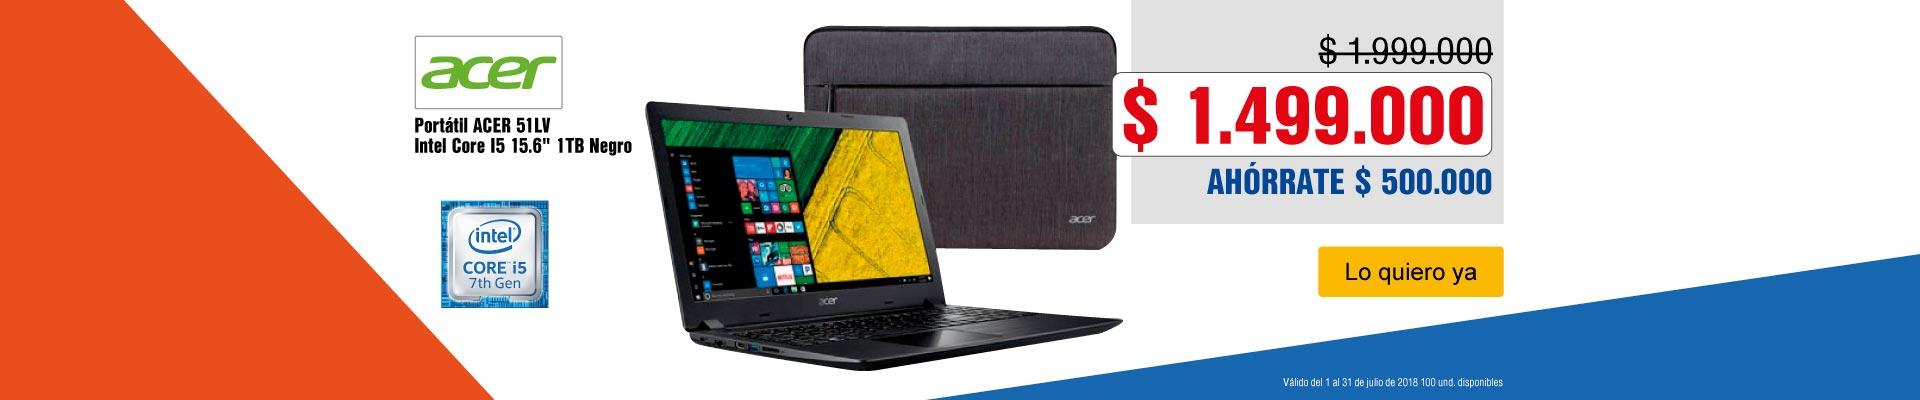 AK-PPAL-3-computadores y tablets-PP---Acer-Portátil 51LV-Jul18